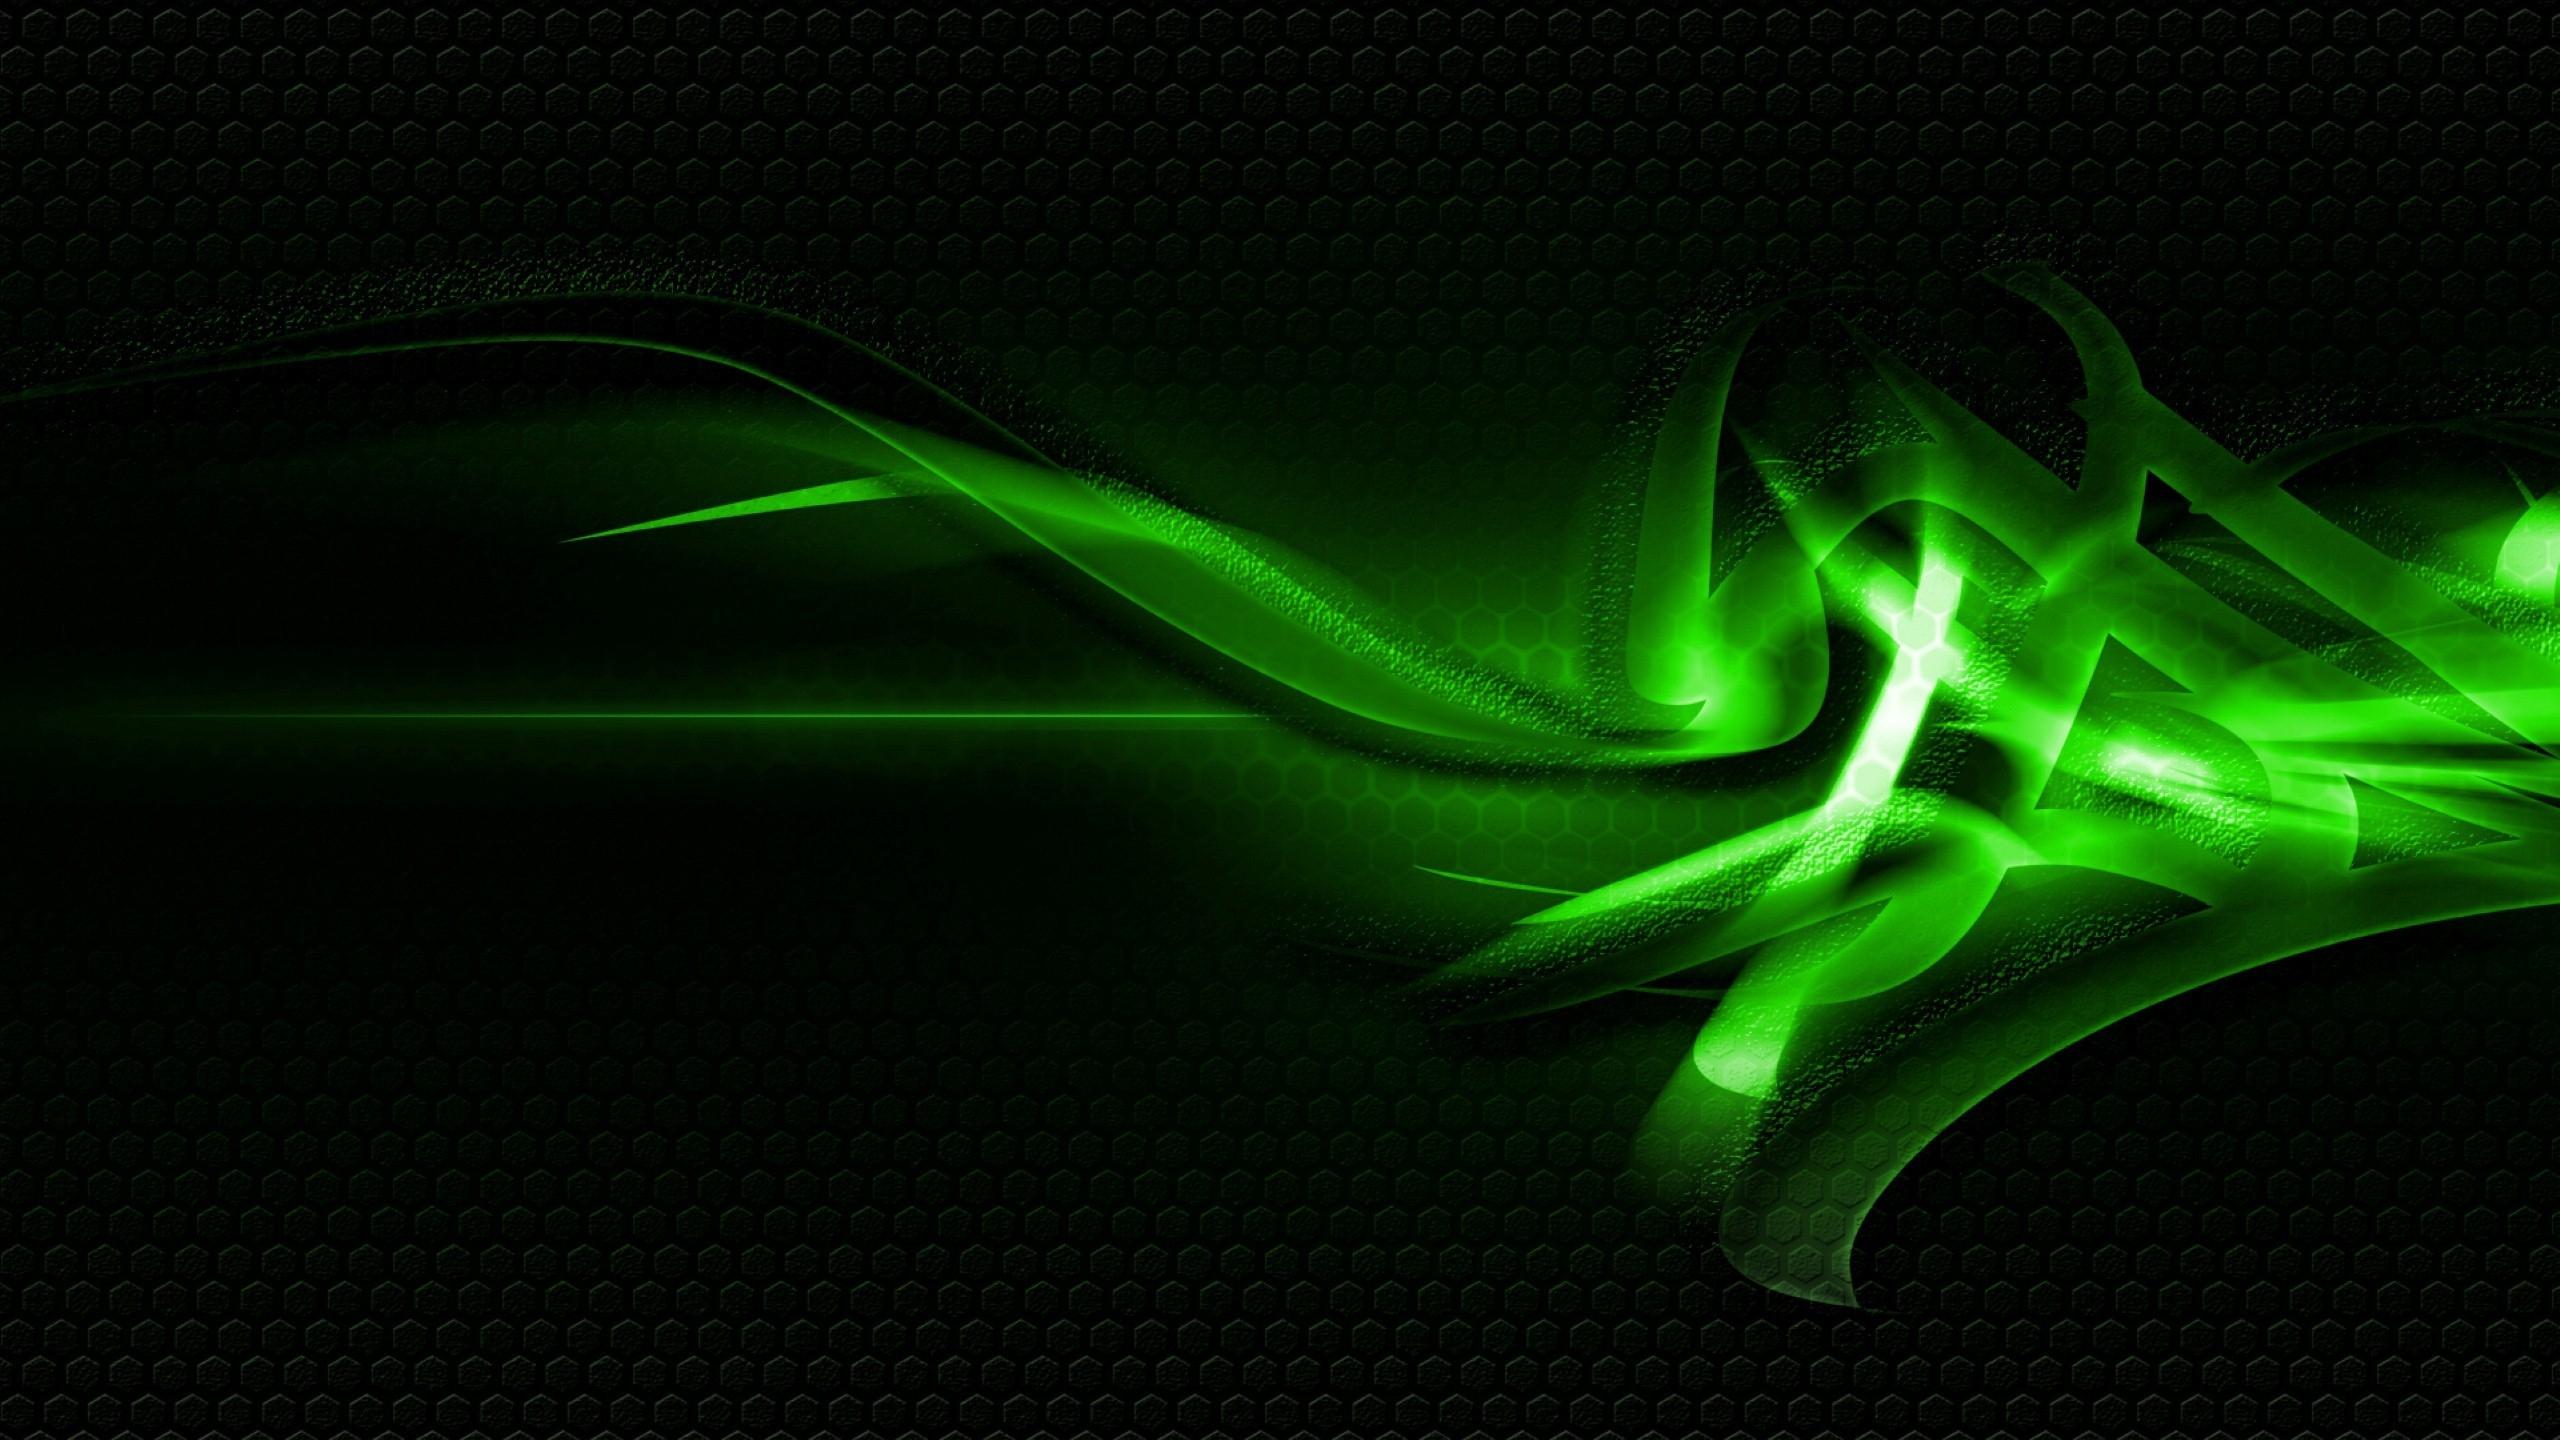 2560x1440 Wallpaper patterns green light dark 2560x1440